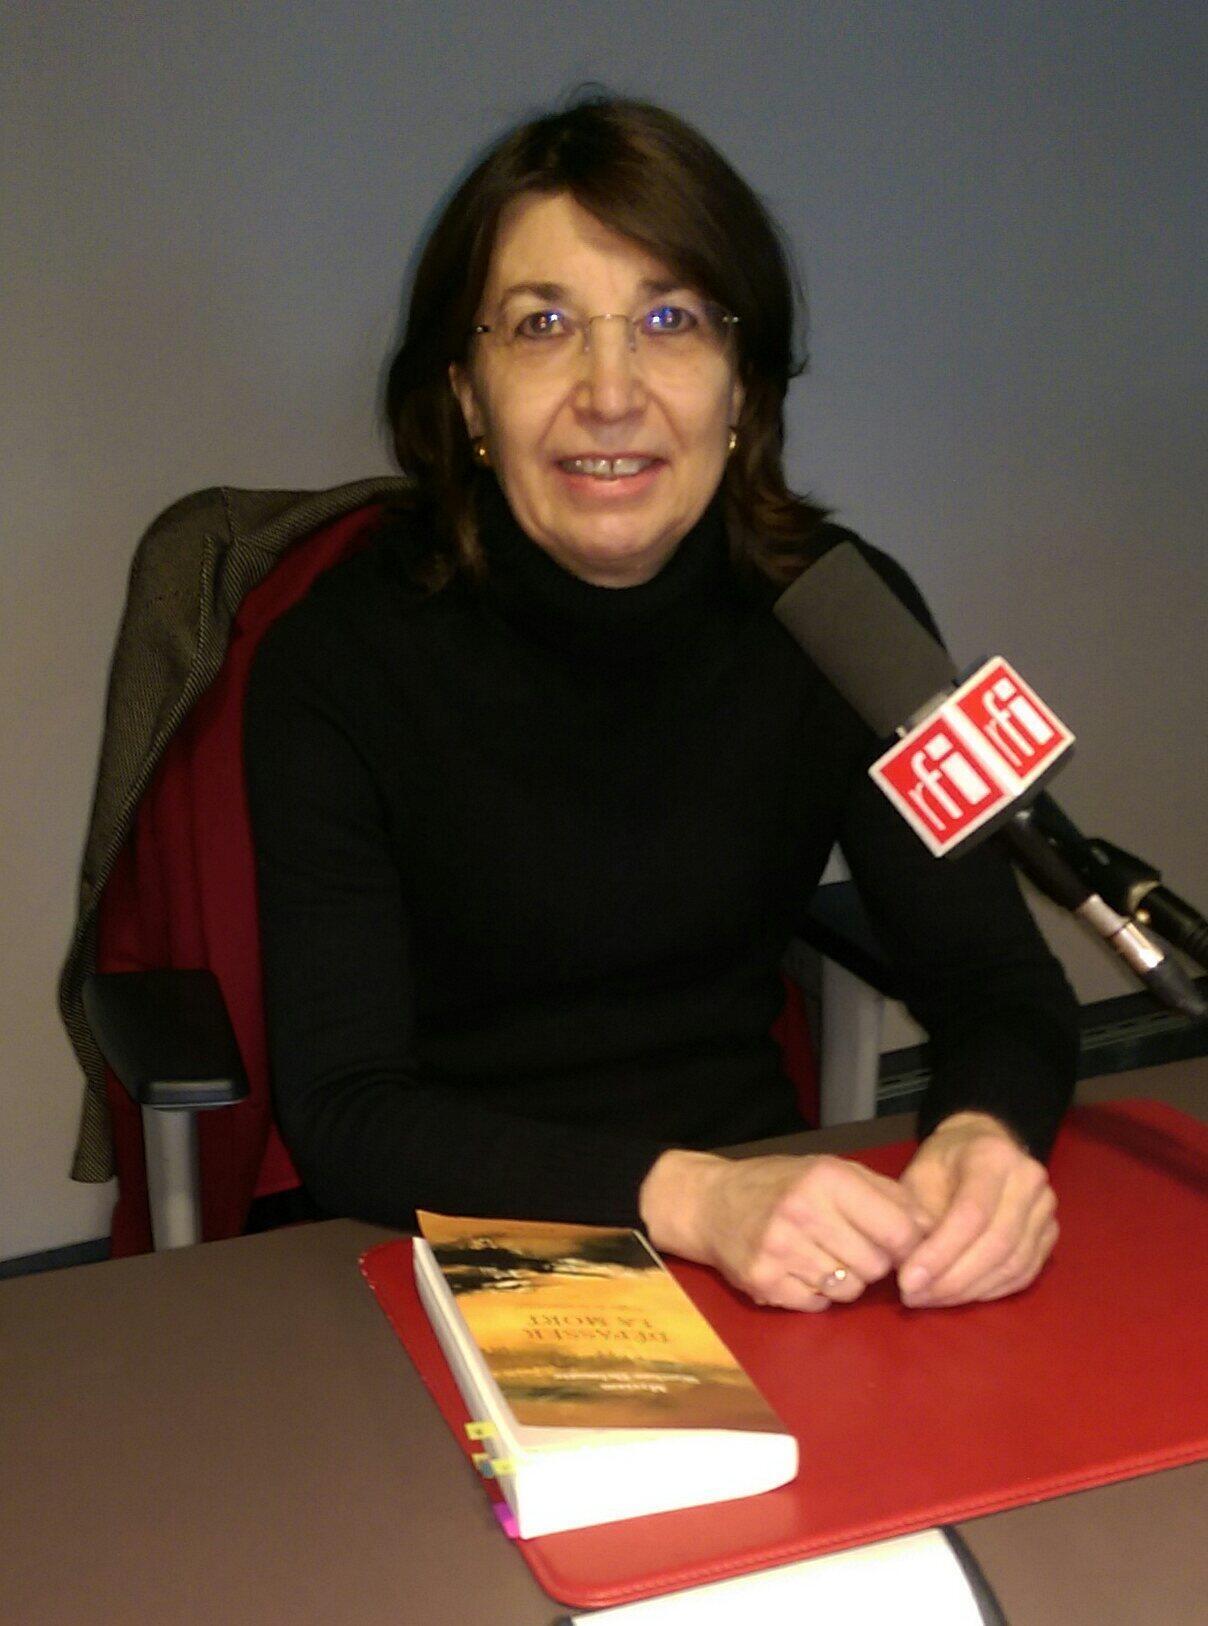 Myriam Wathee-Delmotte.